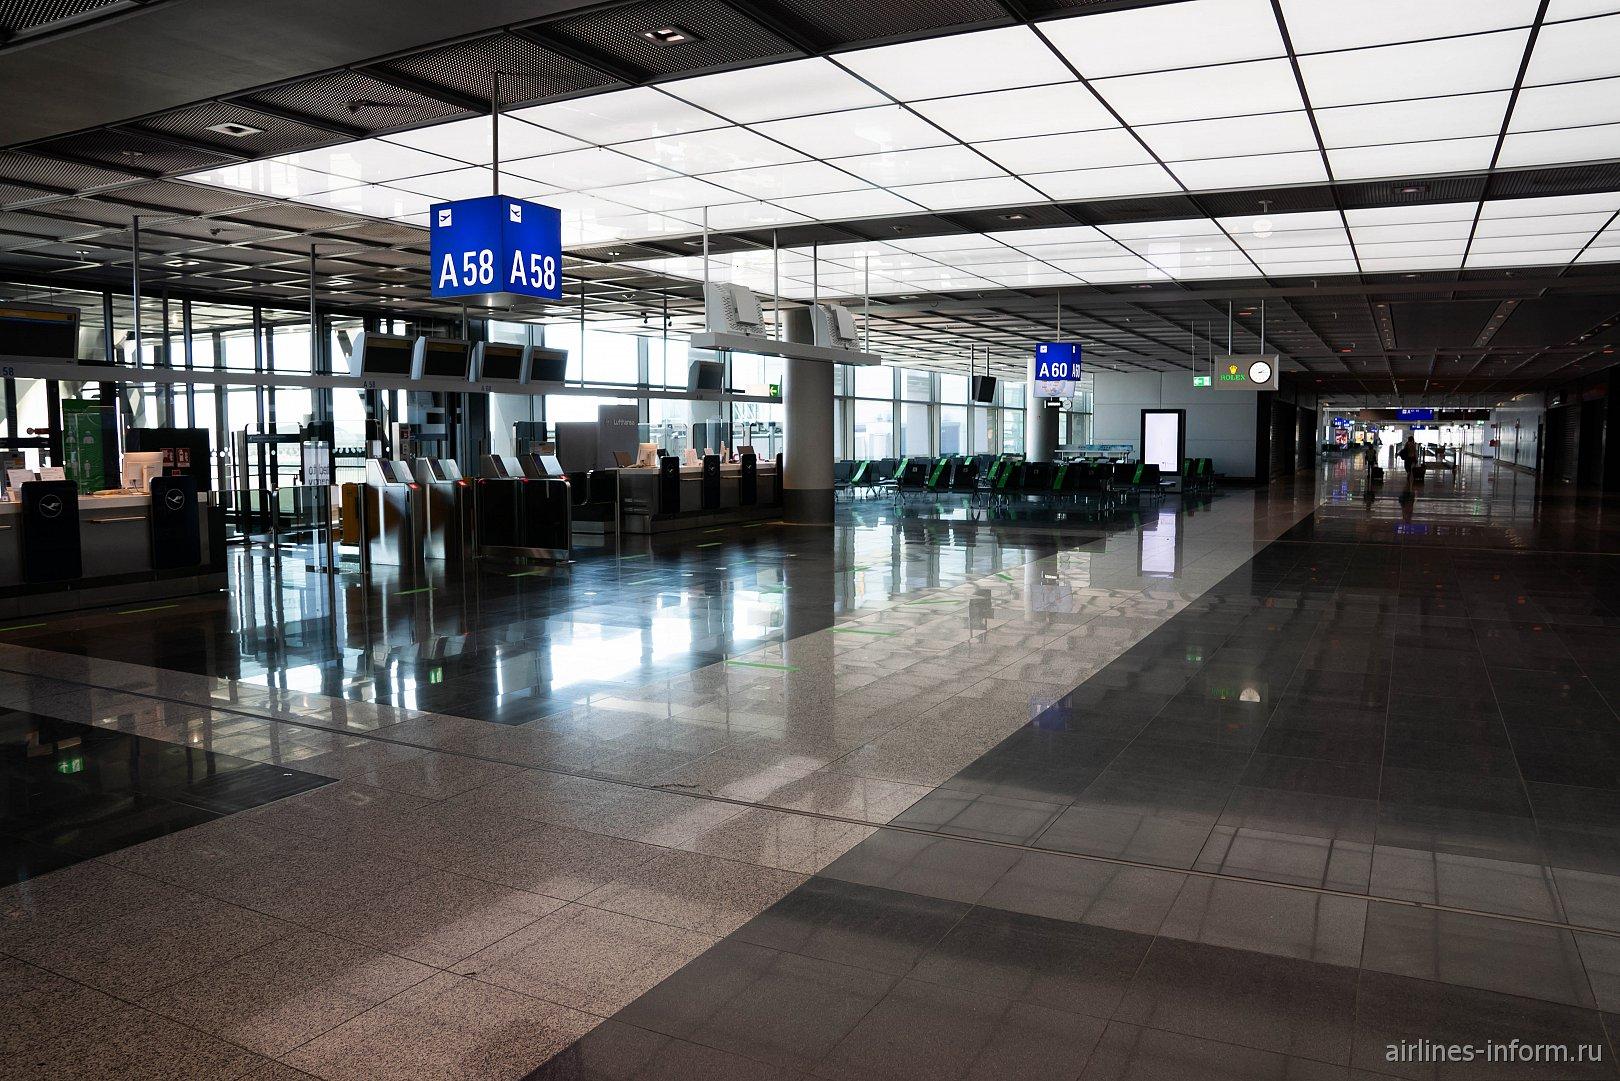 Выход на посадку в терминале 1 аэропорта Франкфурт